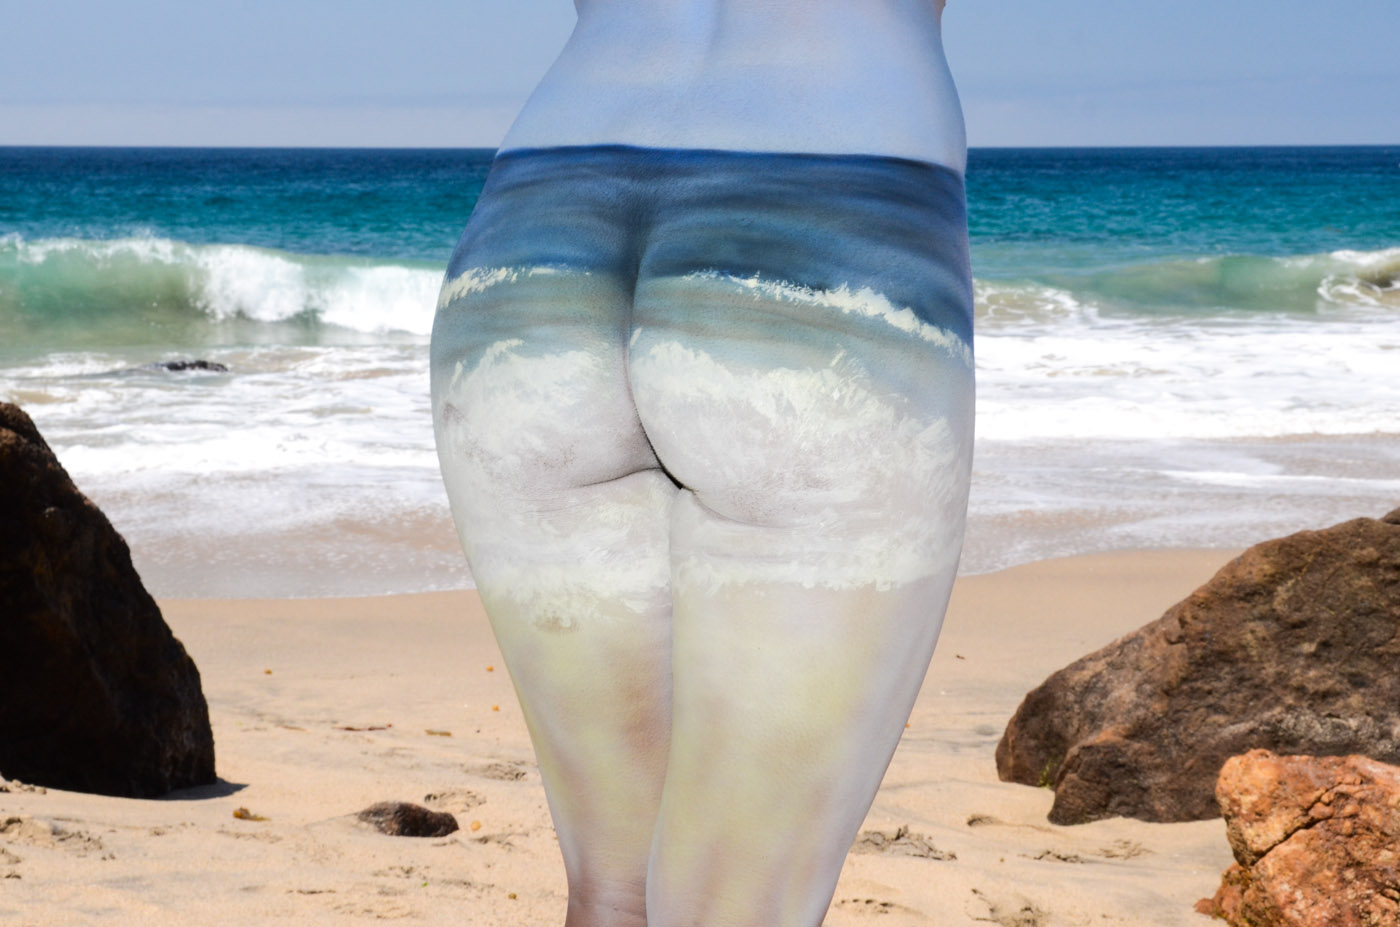 Beach Bum body painting by body paint artist Paul Roustan